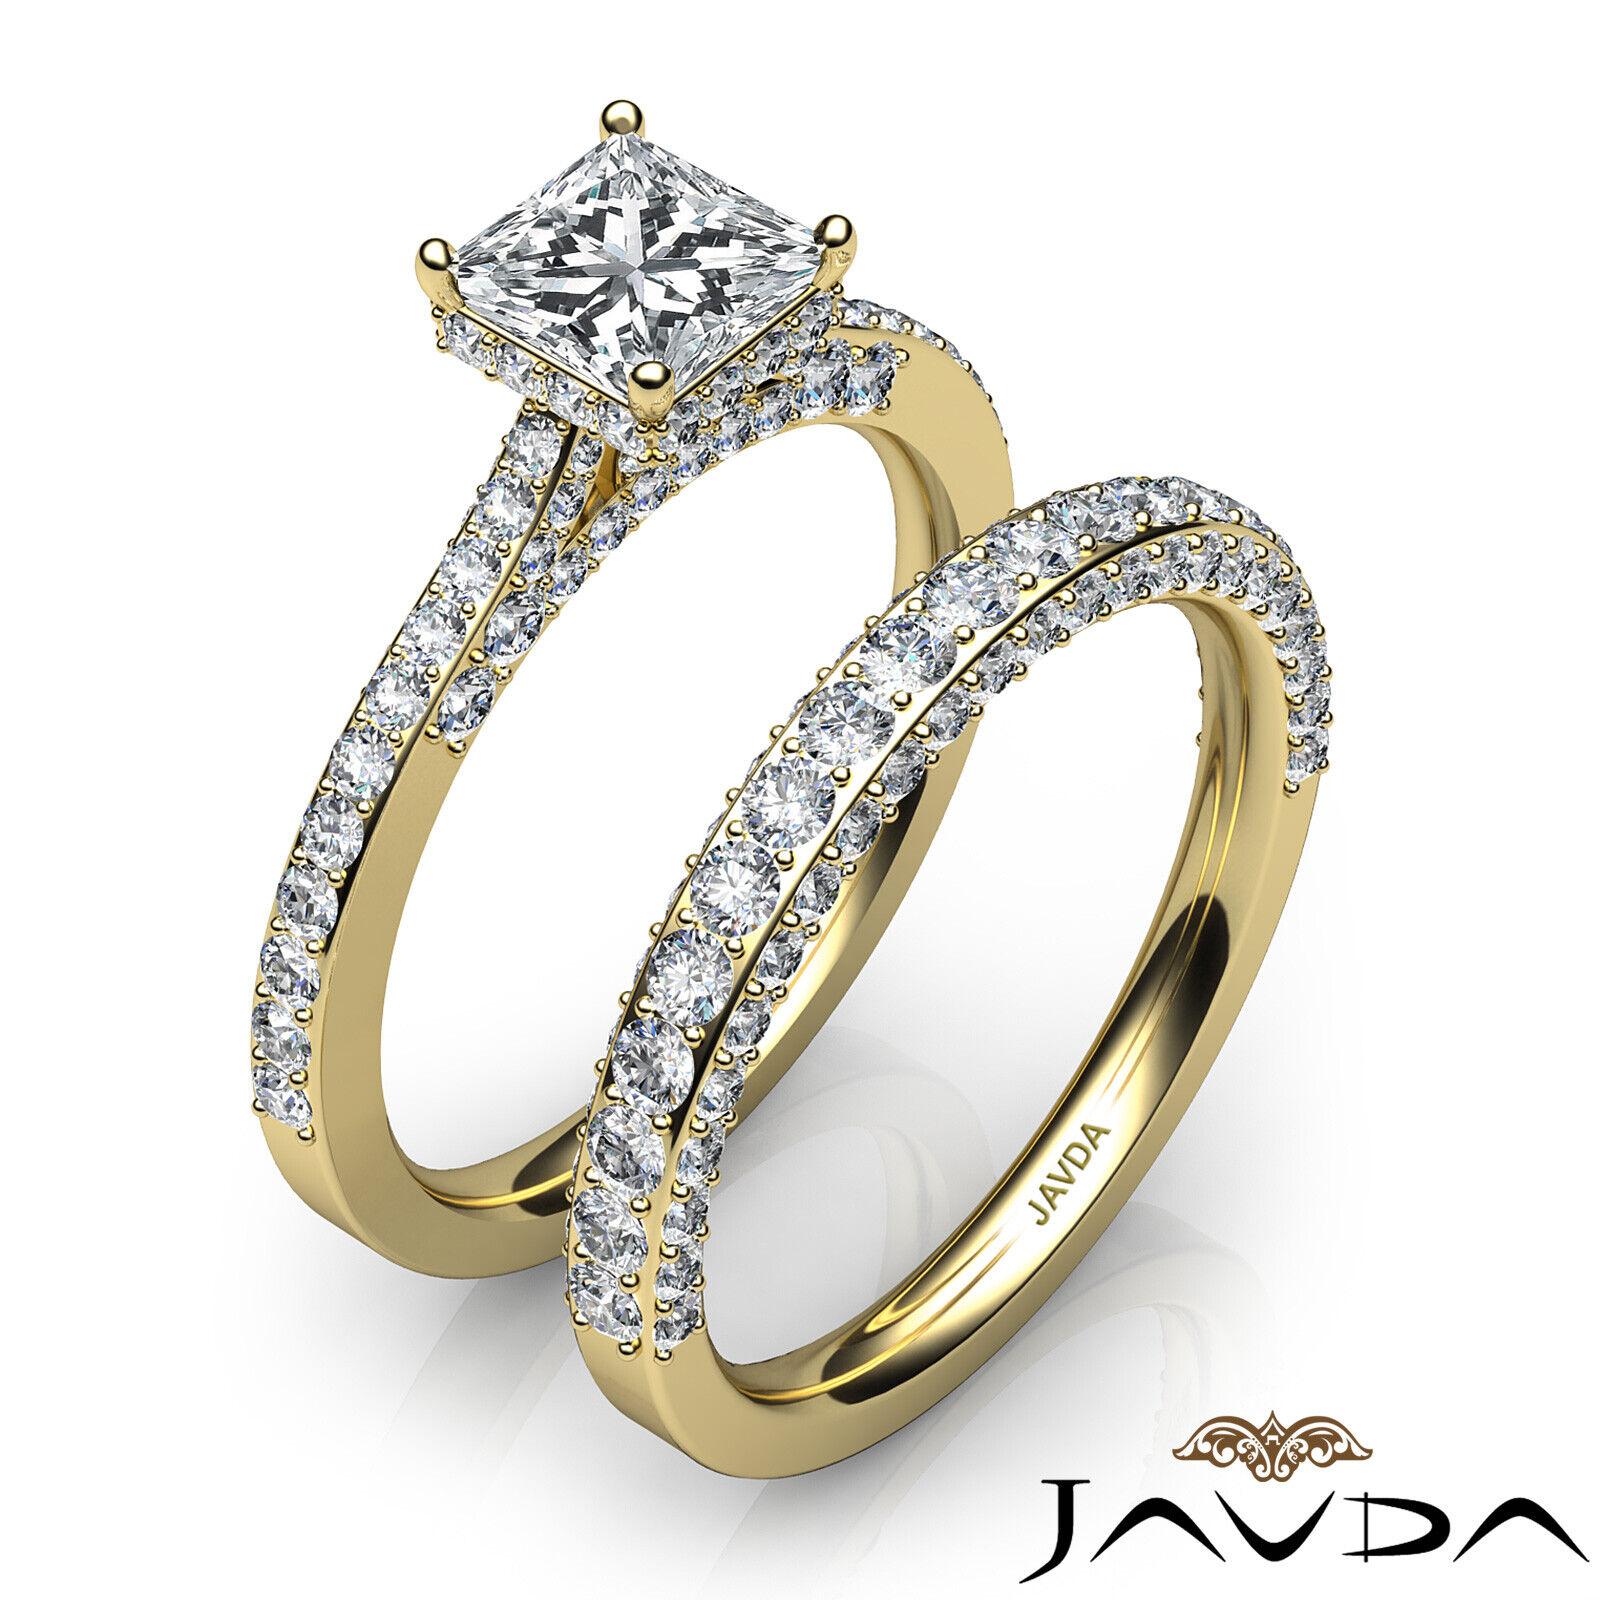 2.35ctw Circa Halo Pave Wedding Set Princess Diamond Engagement Ring GIA G-VVS1 10